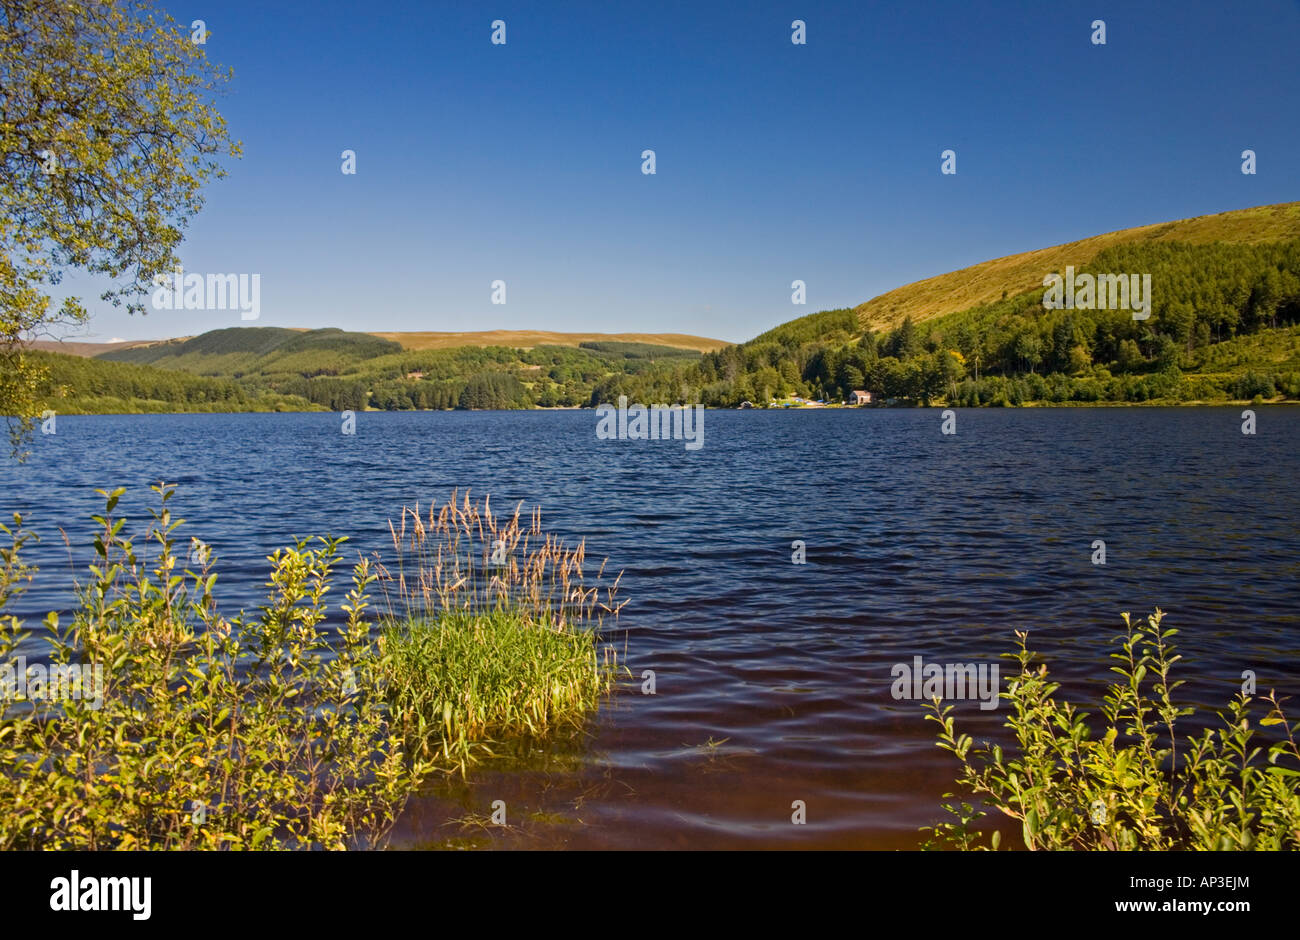 Pontsticill Reservoir, Brecon Beacons National Park, Powys/Merthyr Tydfil border, South Wales, UK Stock Photo